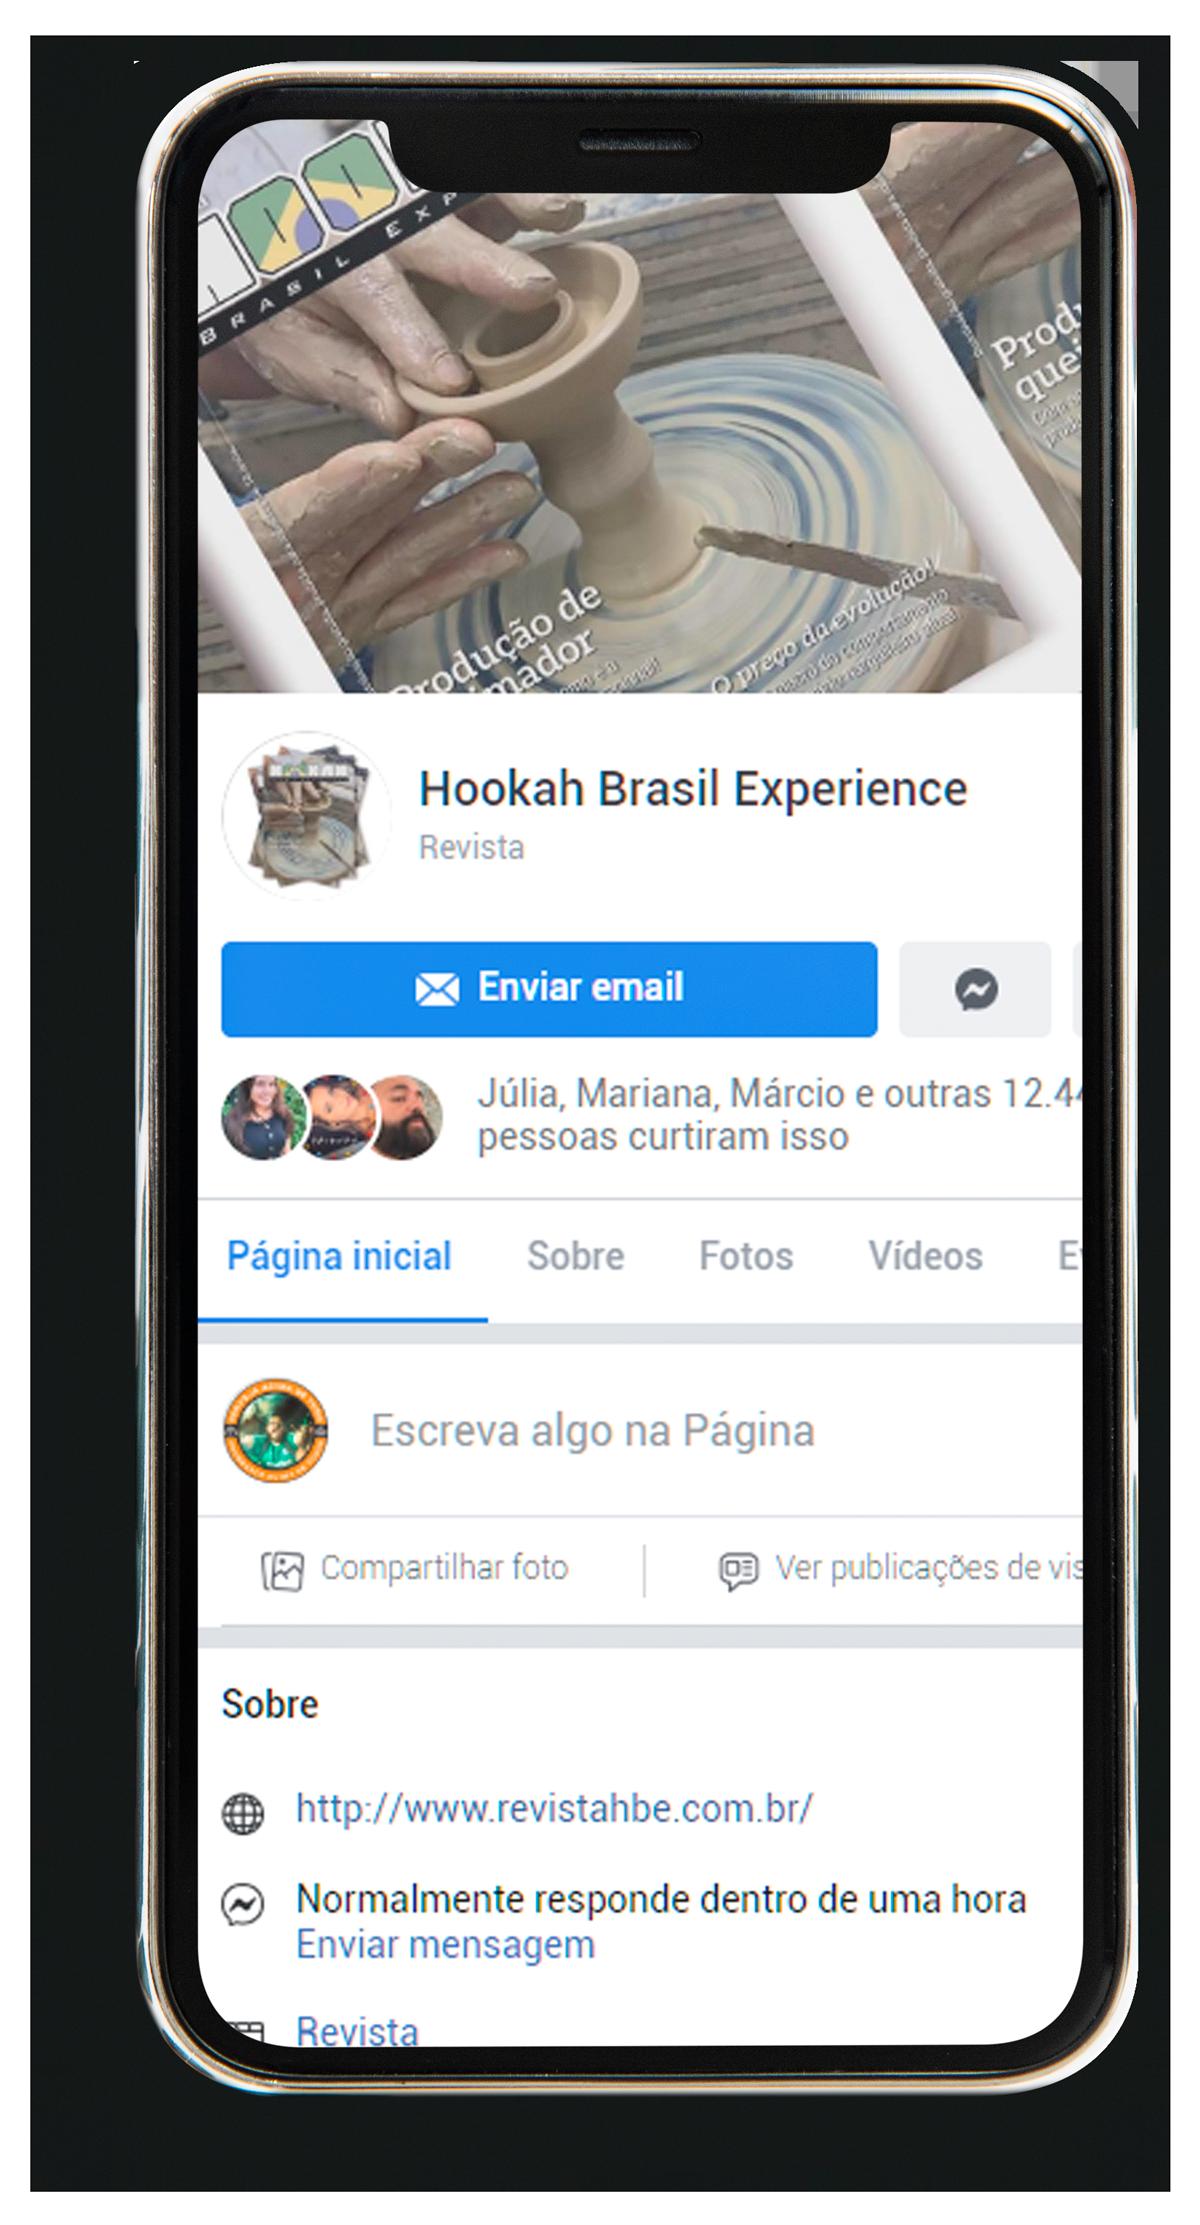 Resenha HBE - Live Semanal via Facebook